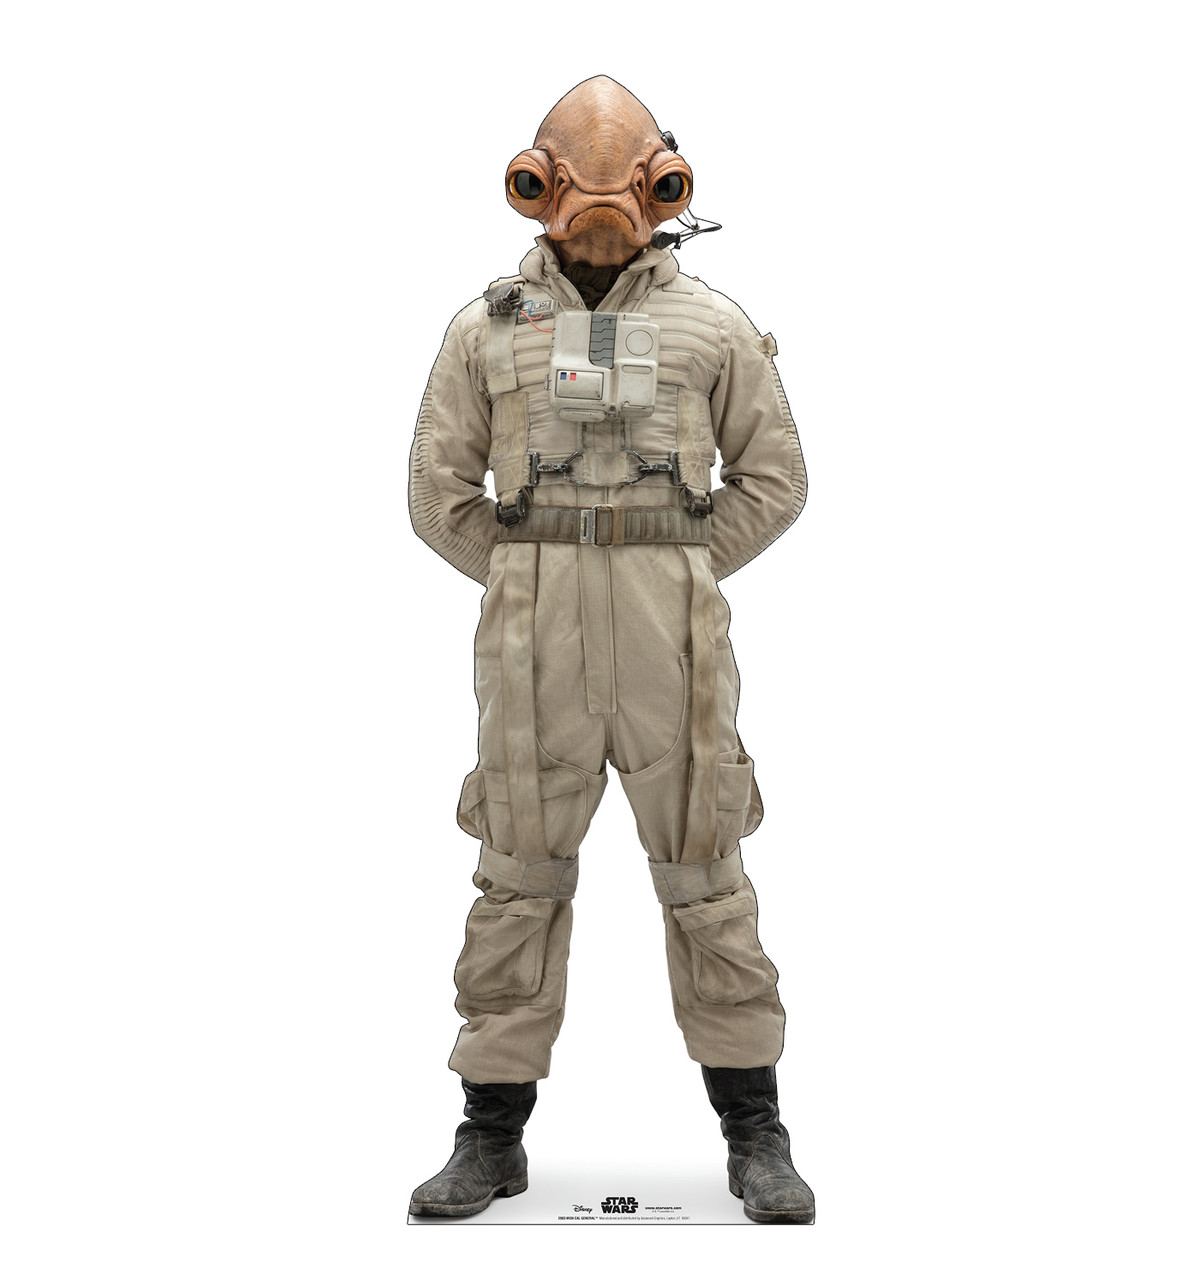 Life-size cardboard standee of Mon Cal General™ (Star Wars IX).